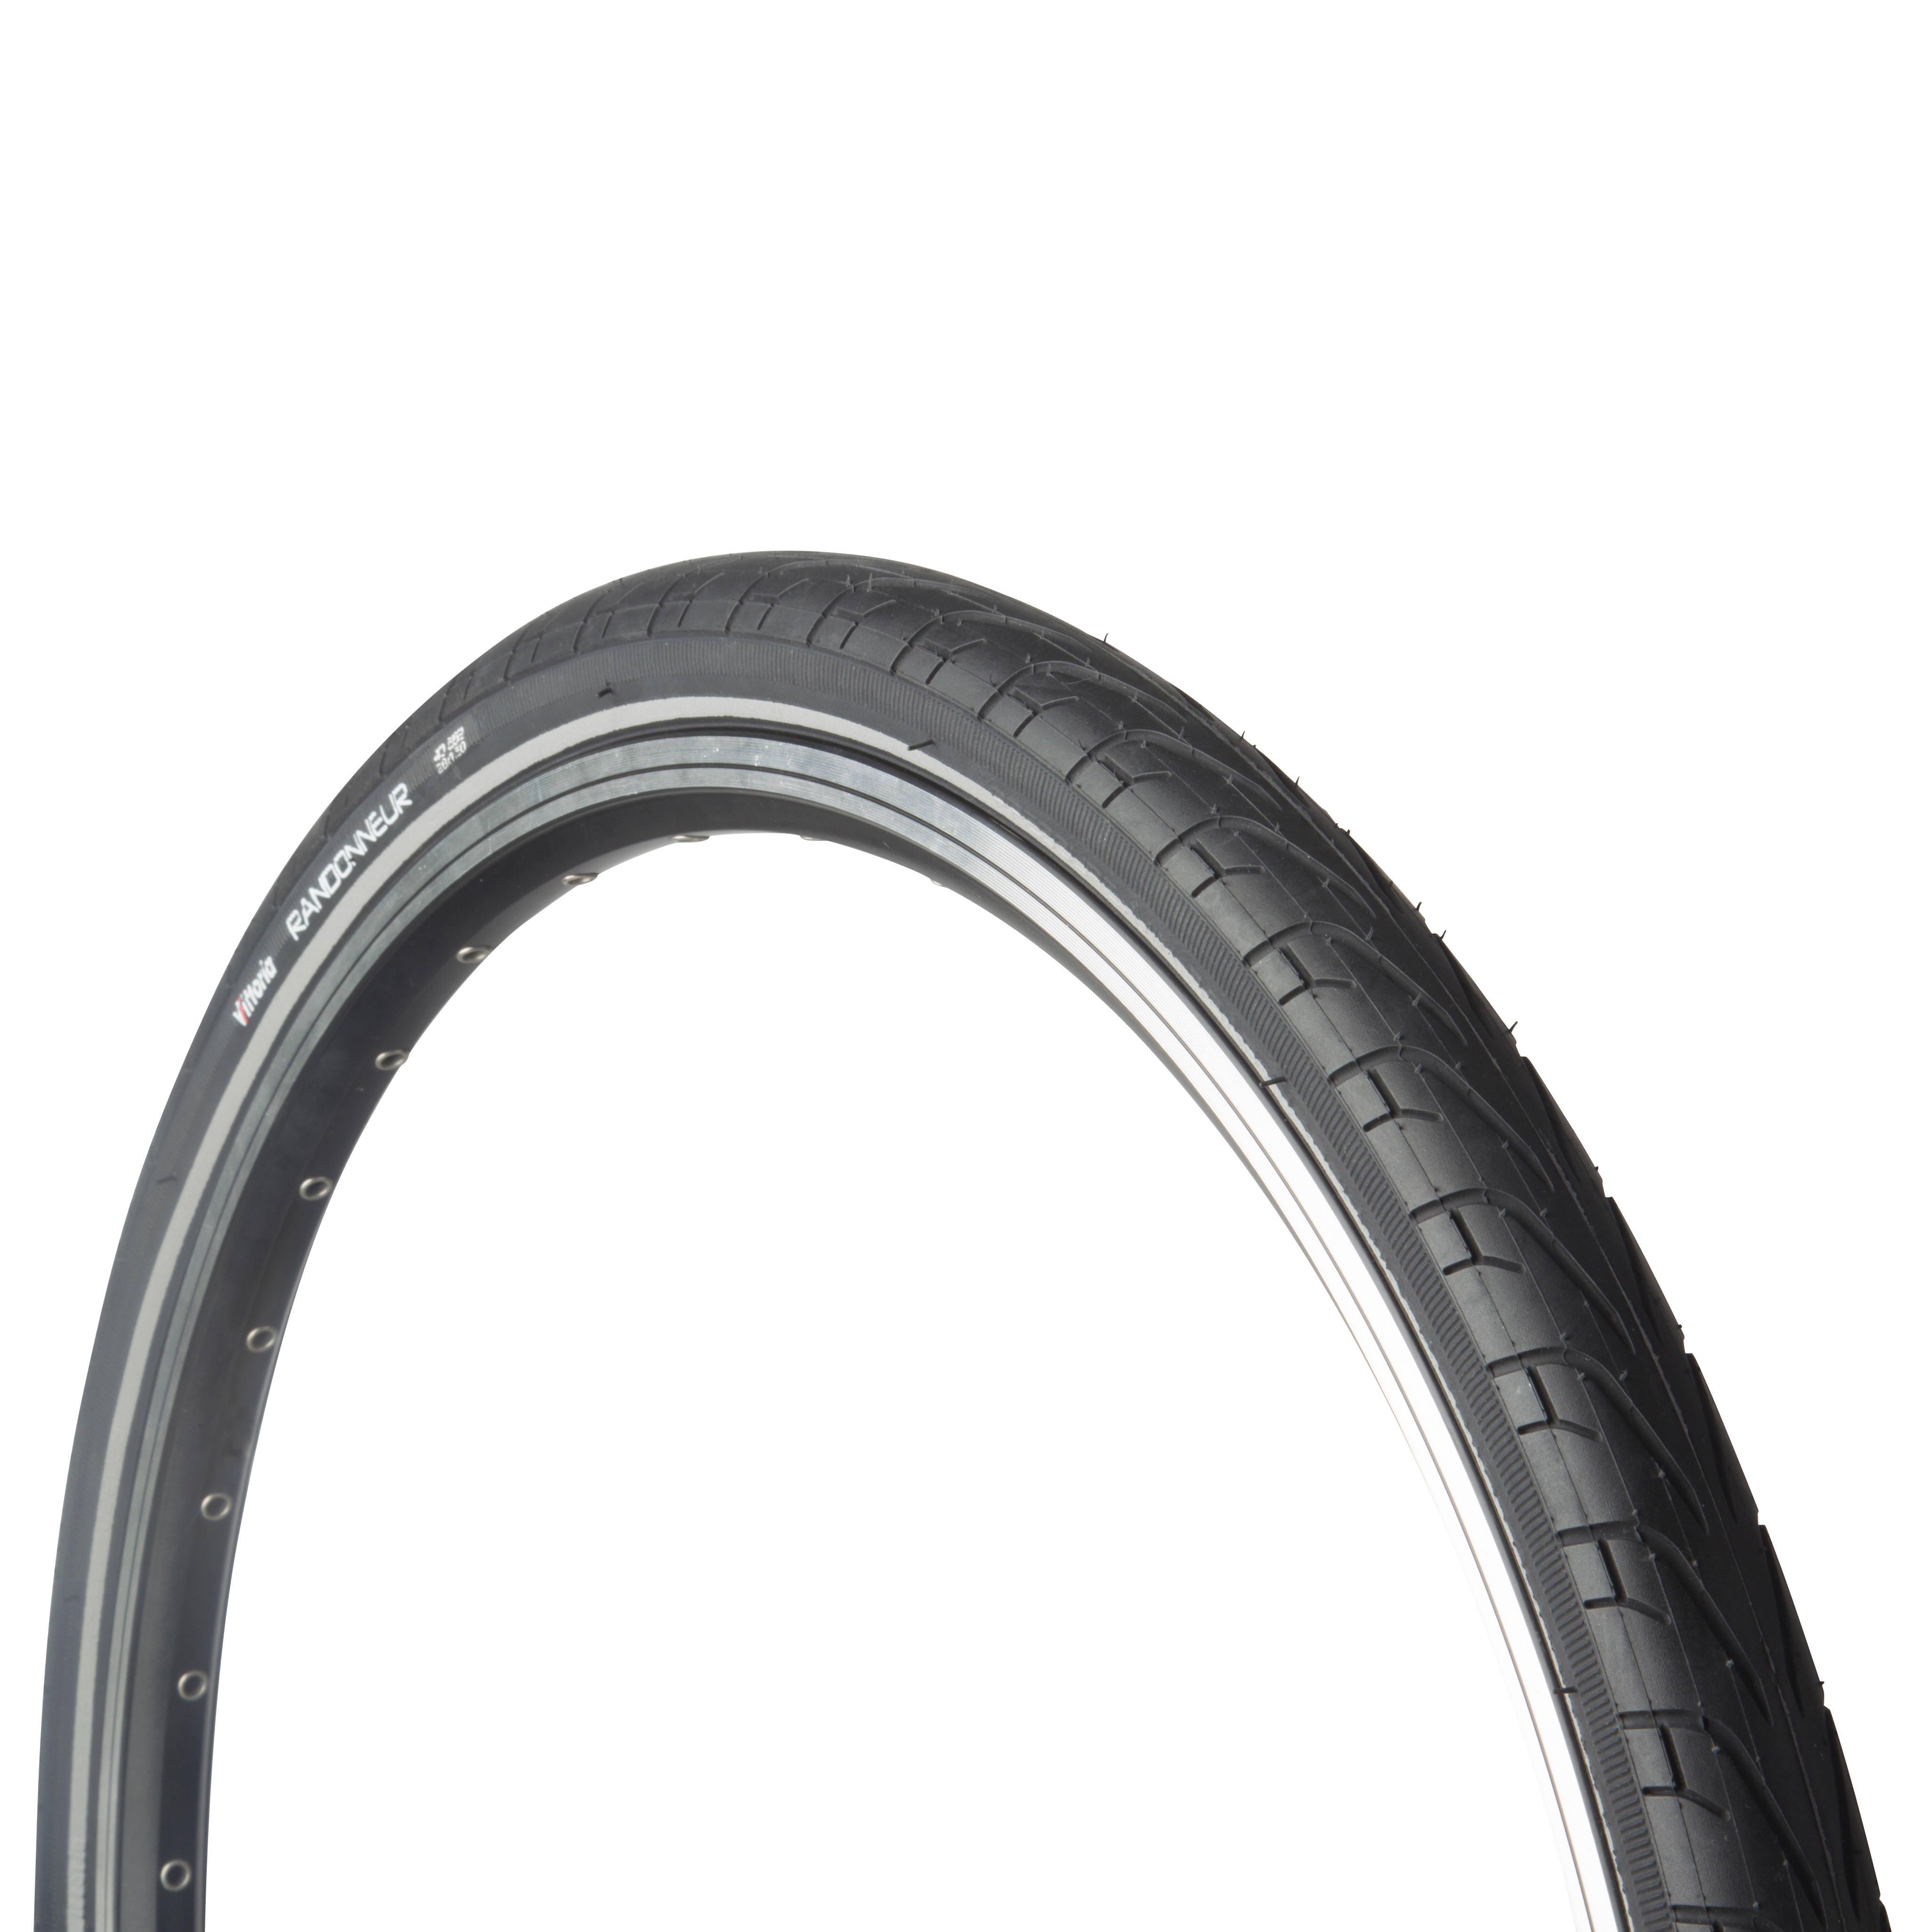 pneu continental decathlon